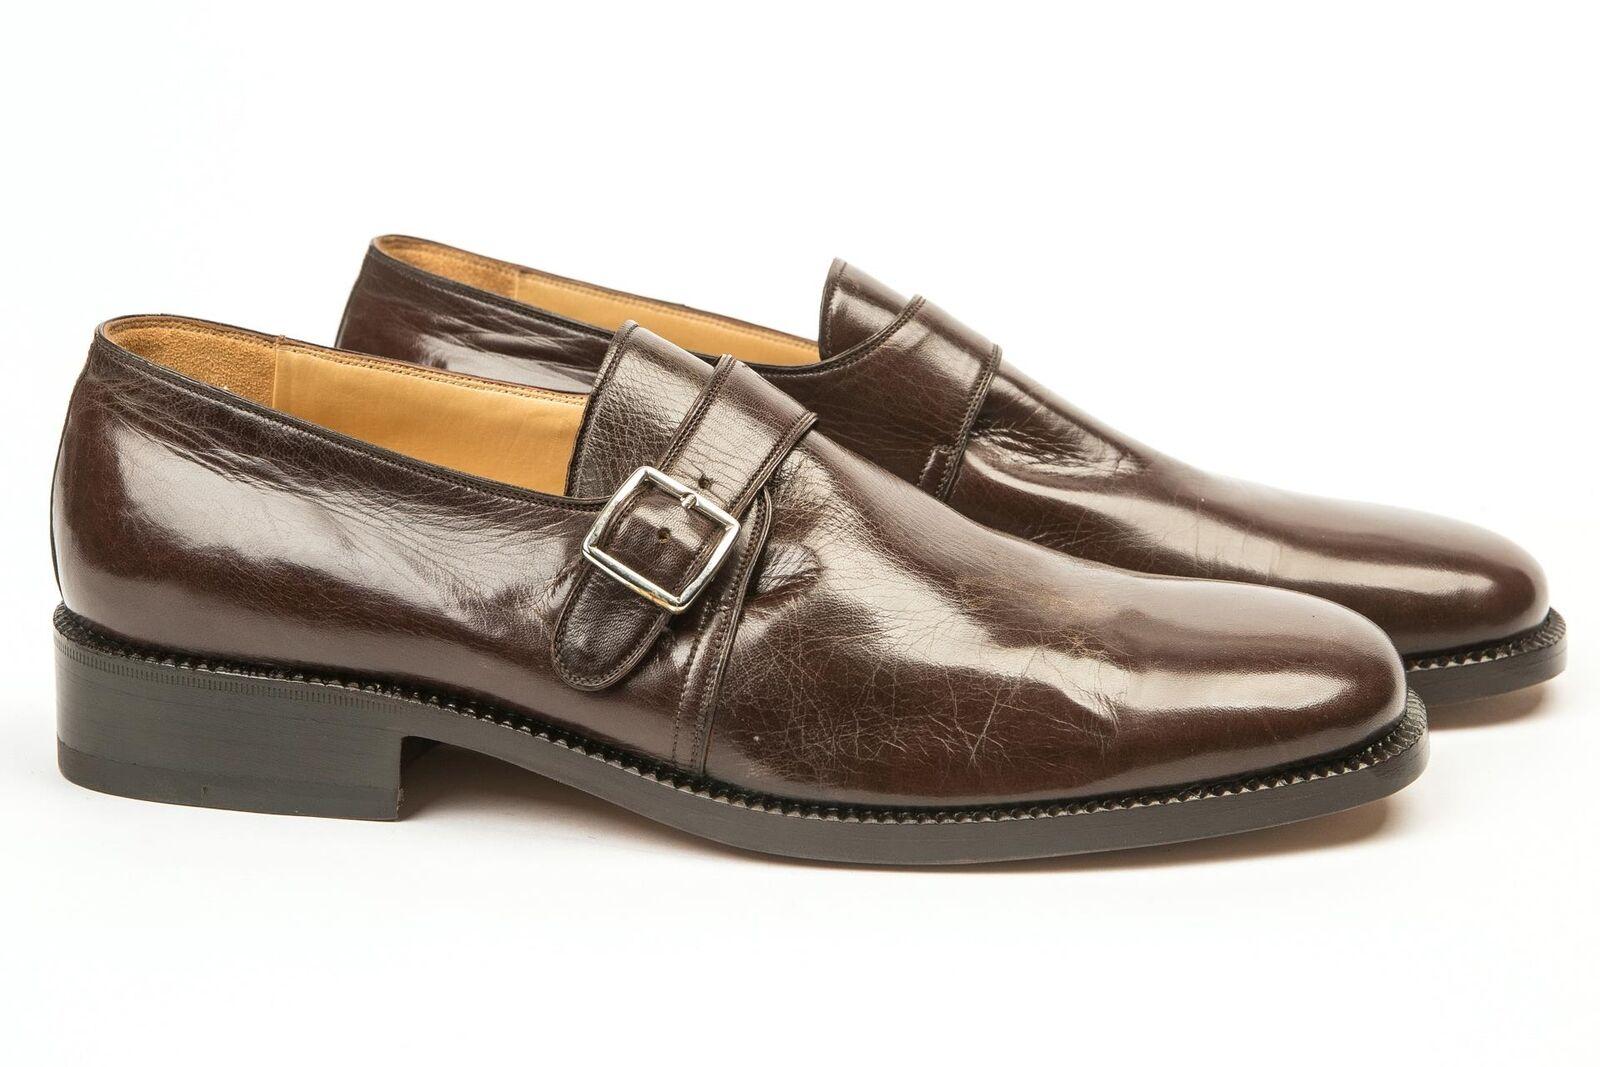 Silvano Lattanzi NIB Brown Plain Toe Single Monk Strap Dress shoes 9.5 US 9 IT